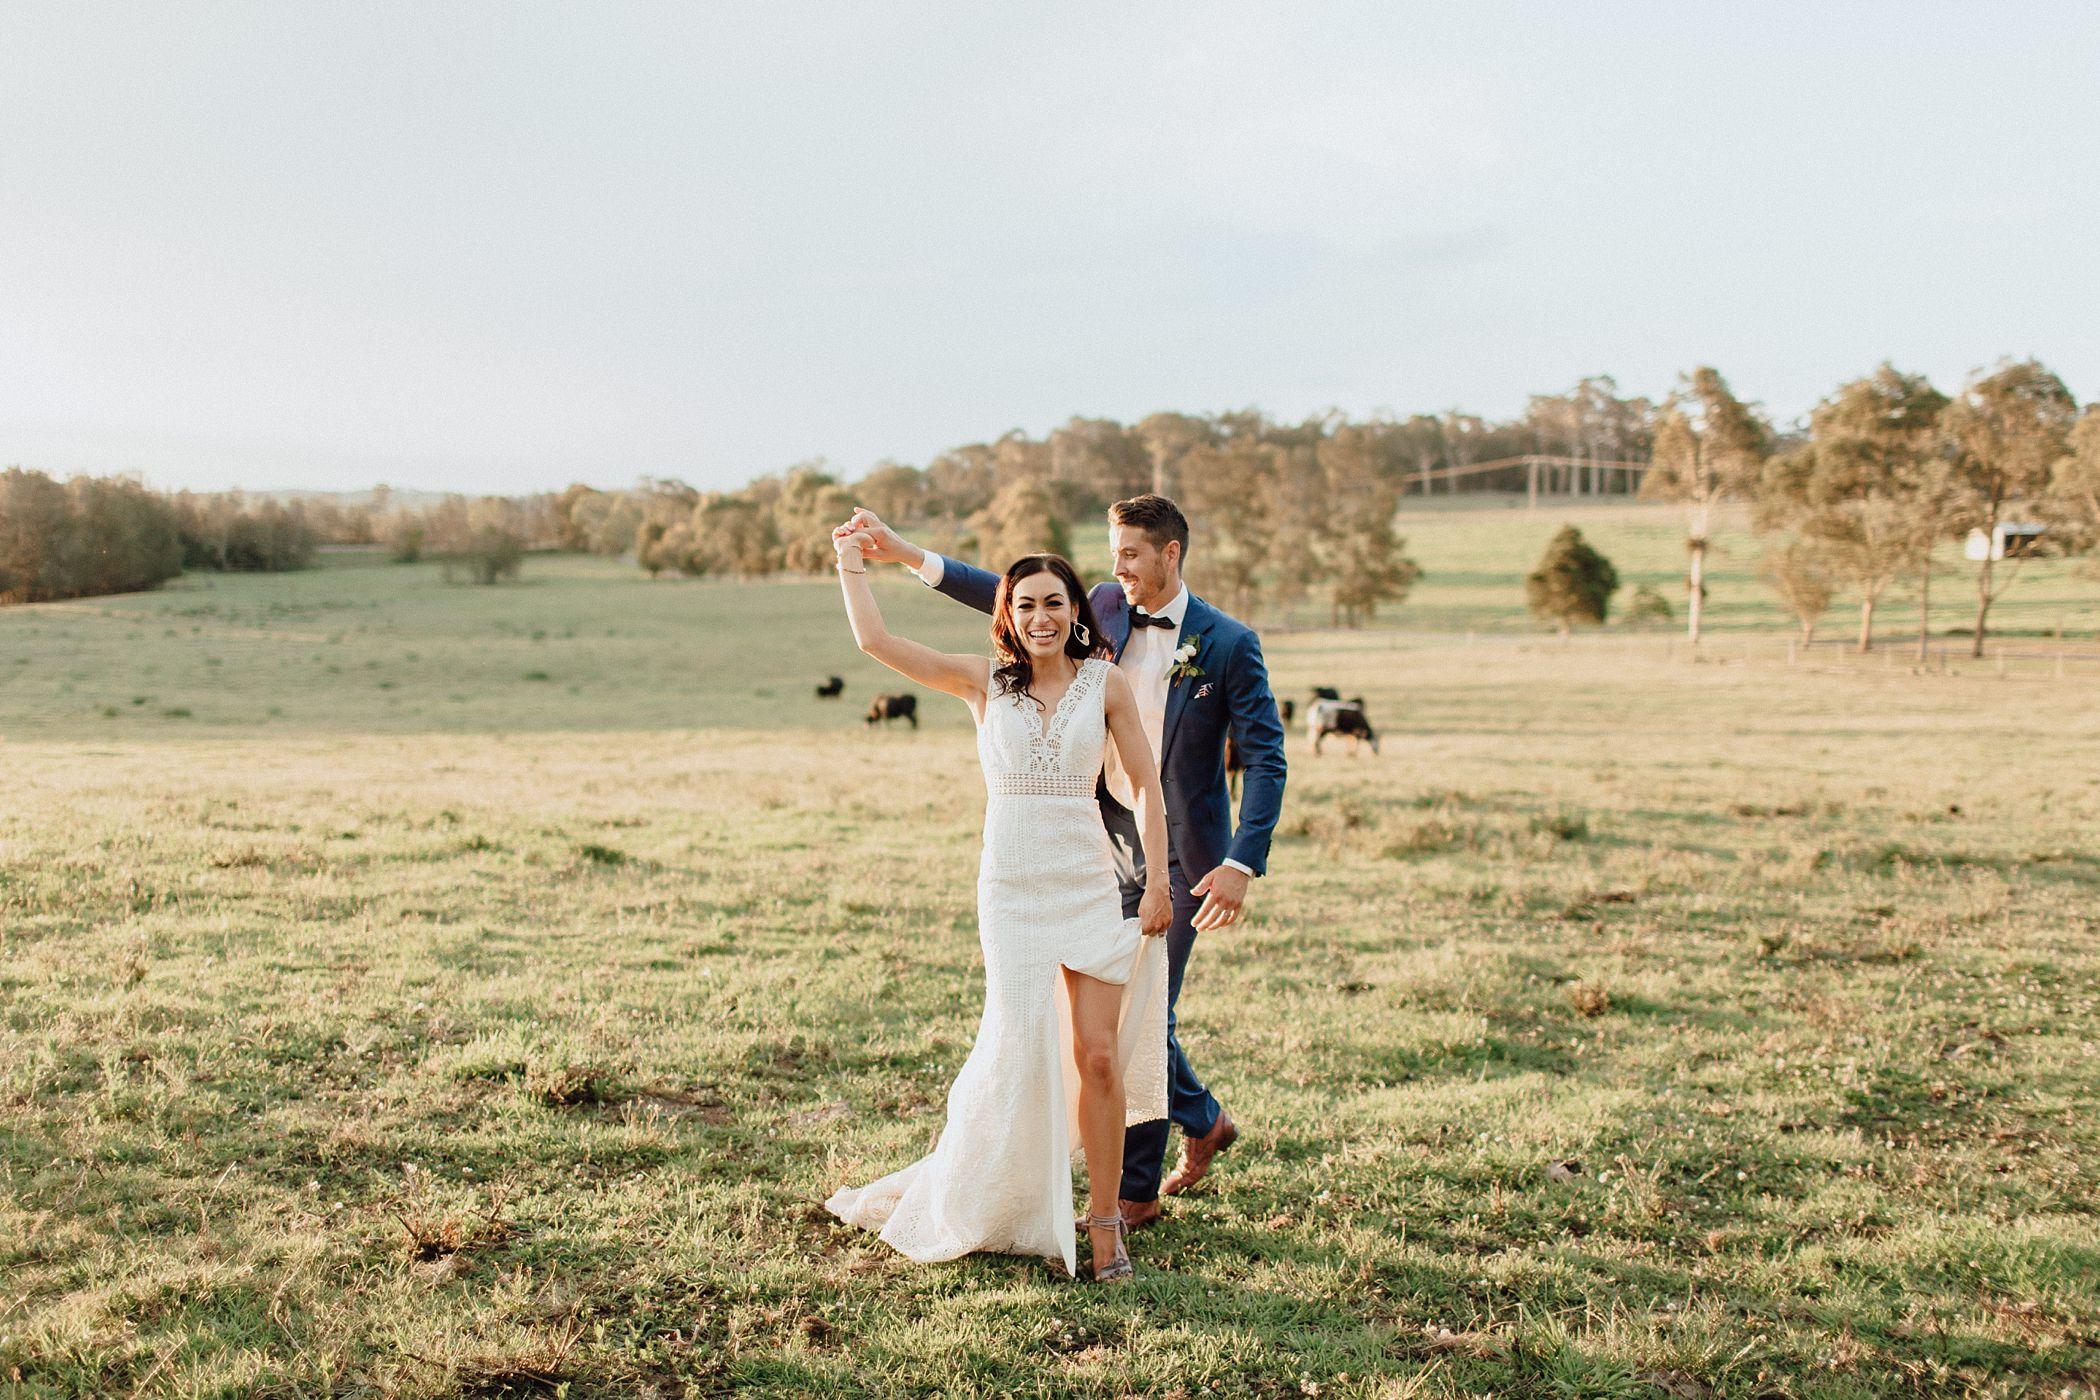 lauren-anne-photography-newcastle-wedding-photographer-mindaribba-house_0119.jpg